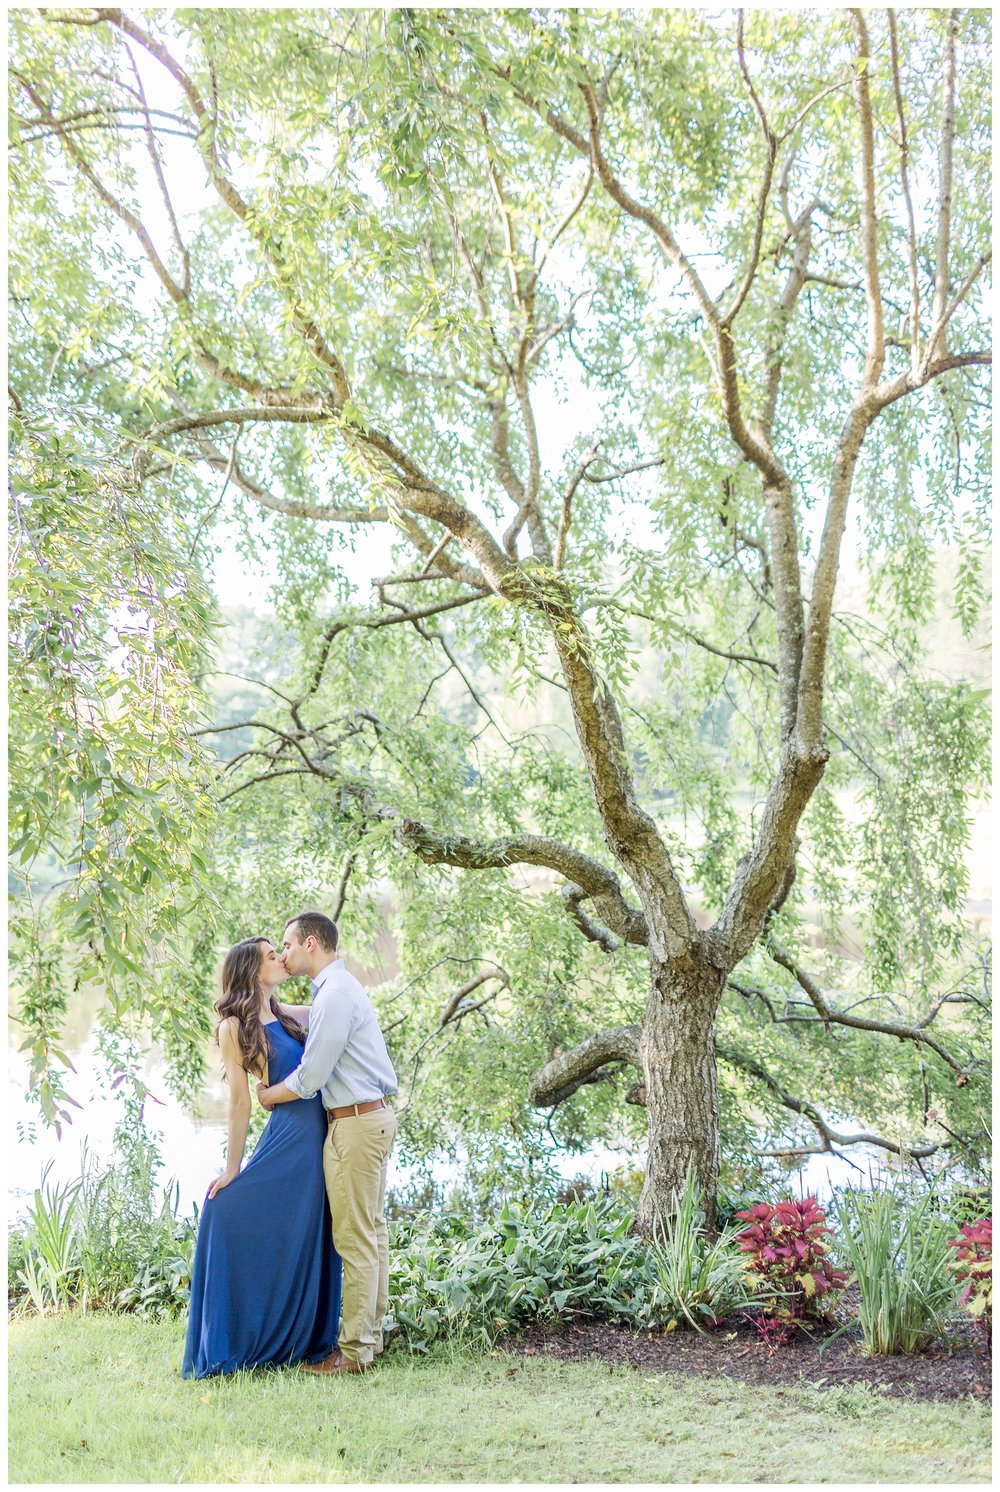 Meadowlark Botanical Garden Engagement | Virginia Wedding Photographer Kir Tuben_0028.jpg